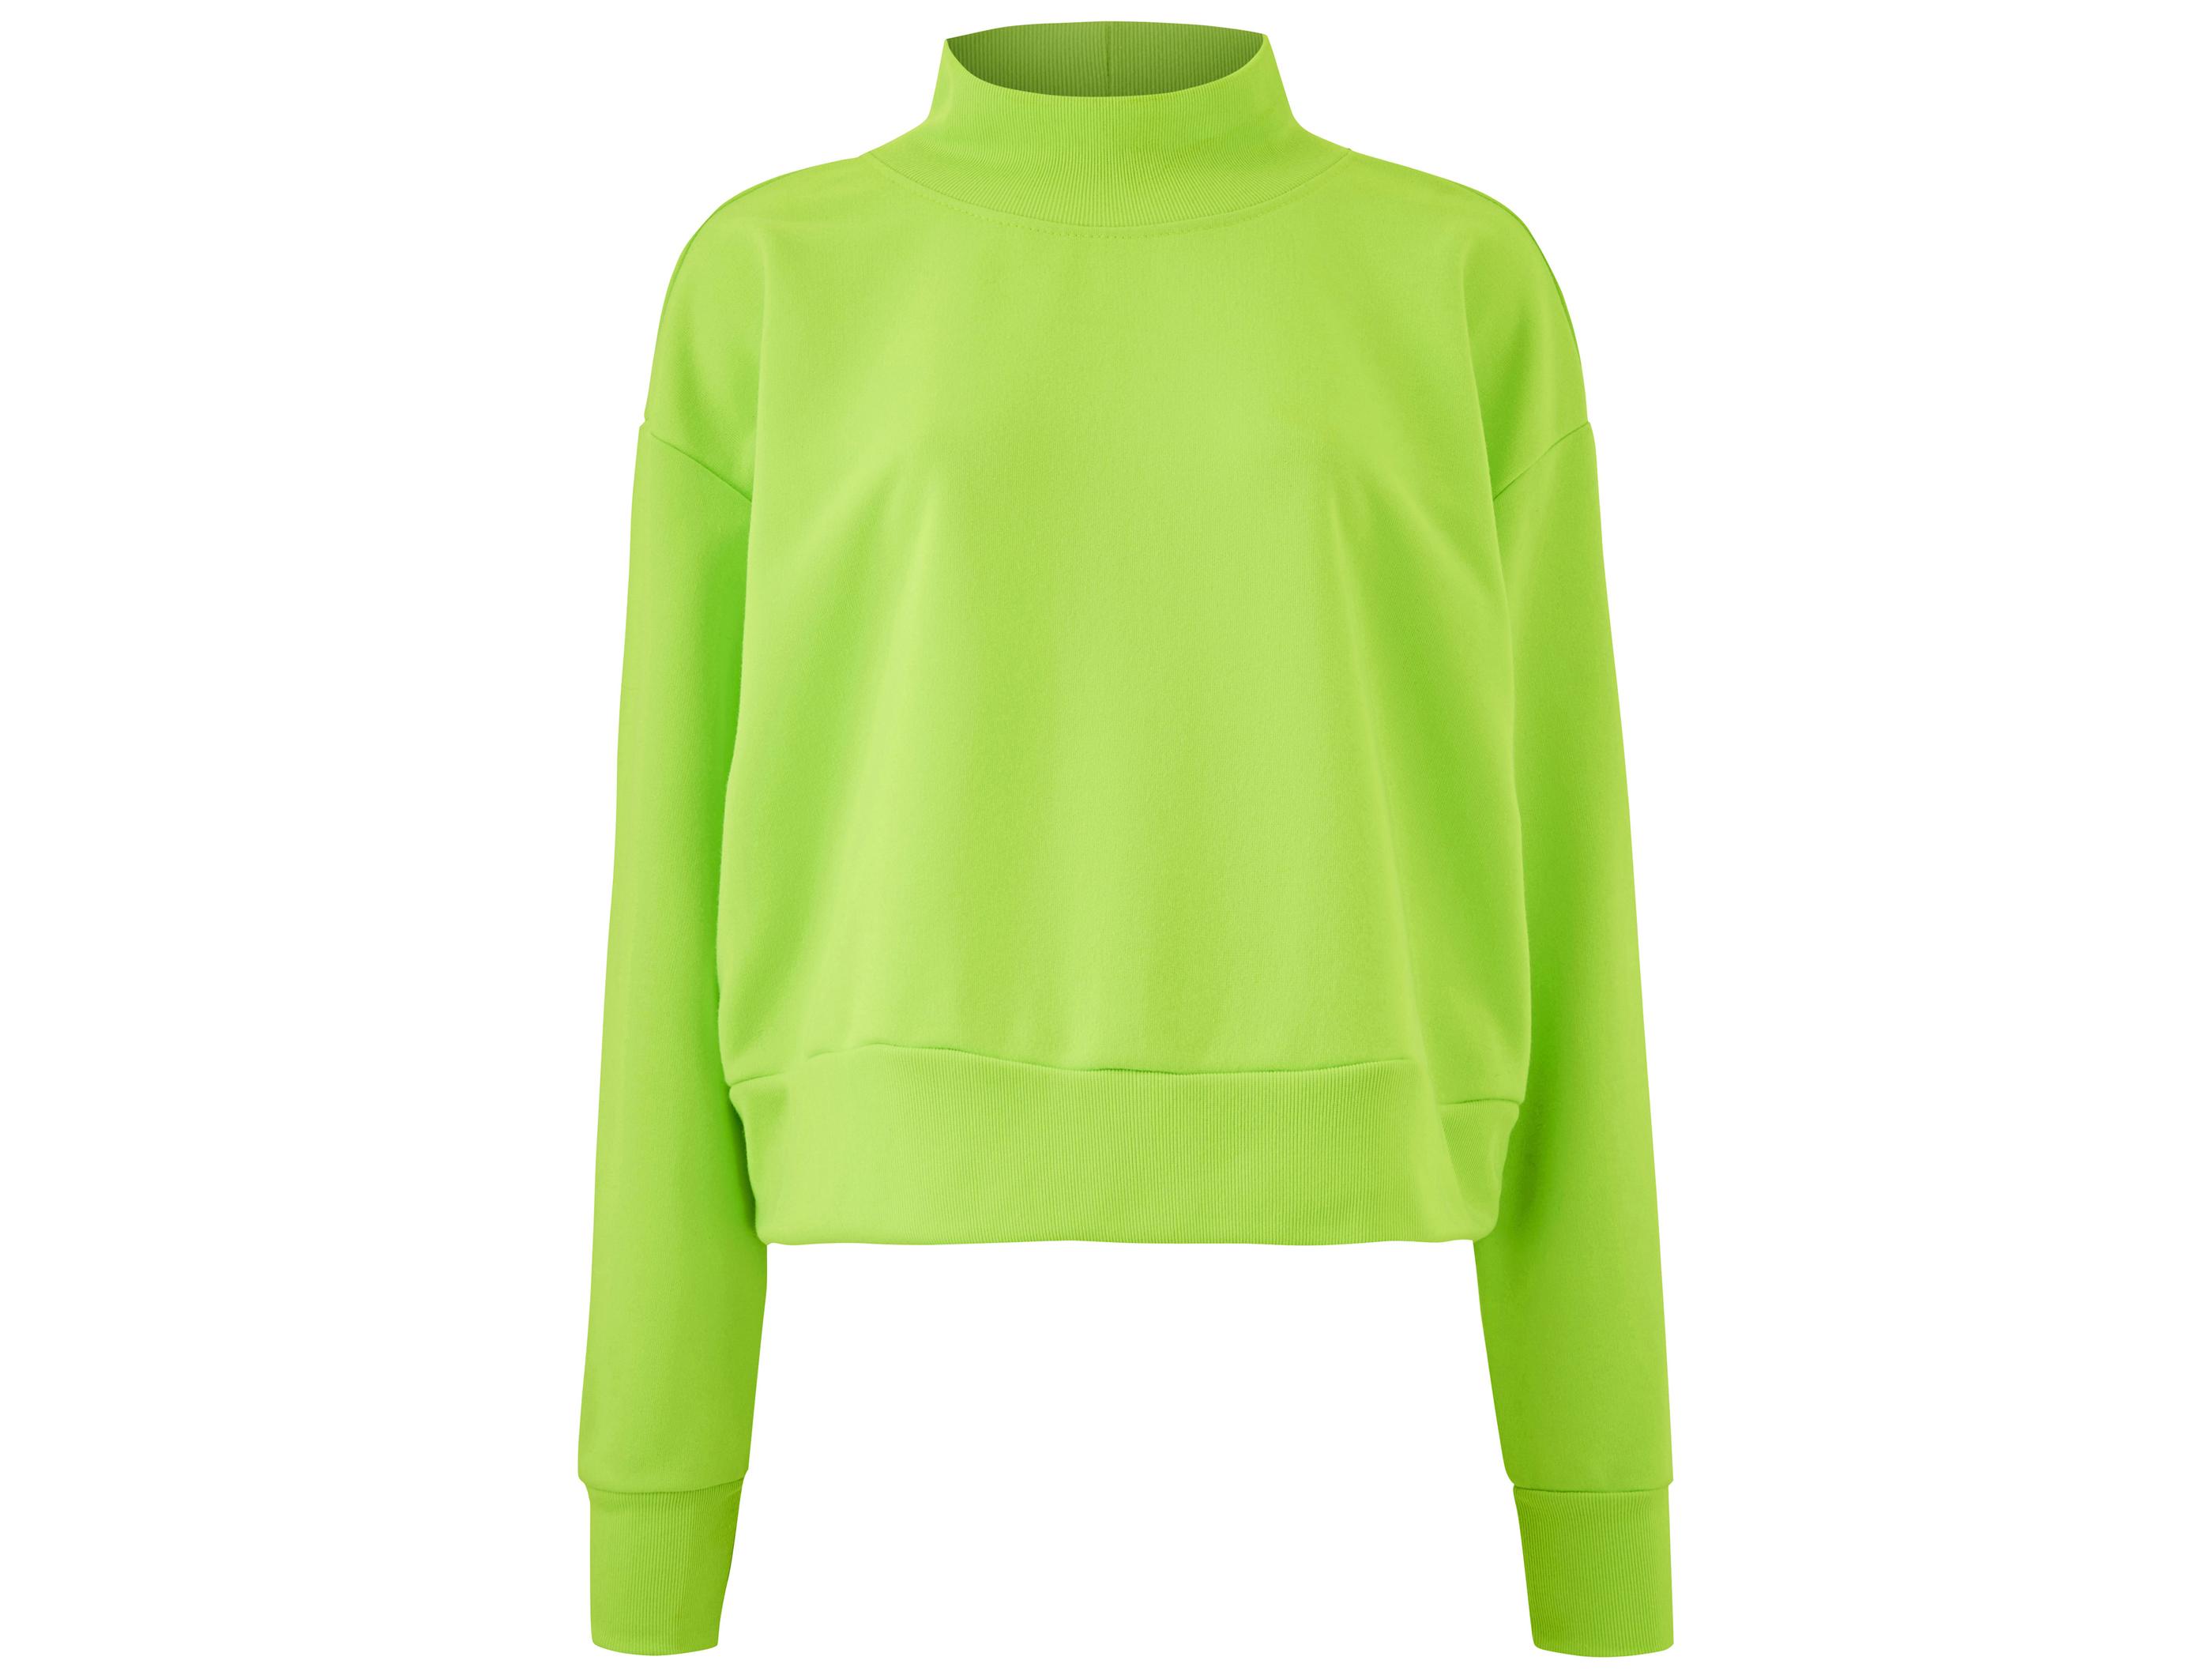 46c1c6280fd77 How to wear neon the grown-up way